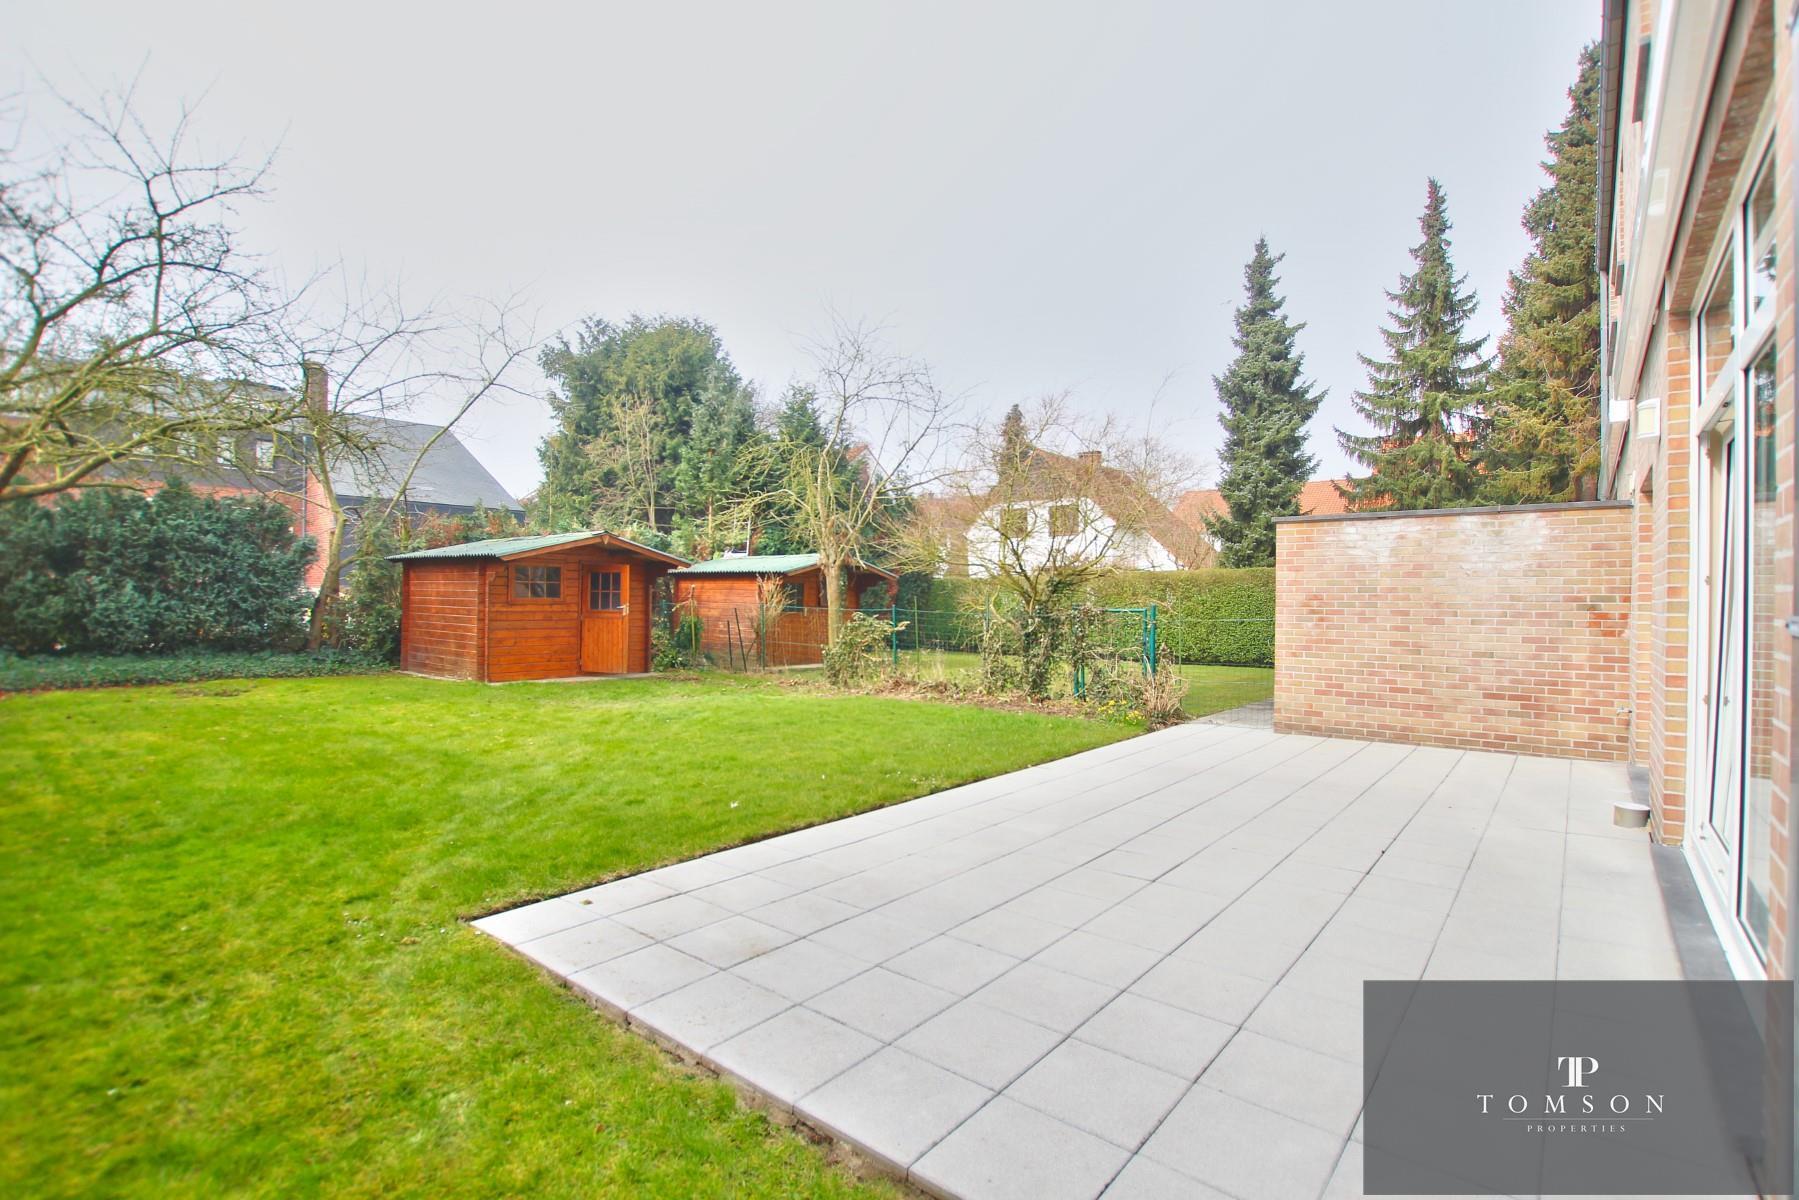 Maison - Kraainem - #4023749-17